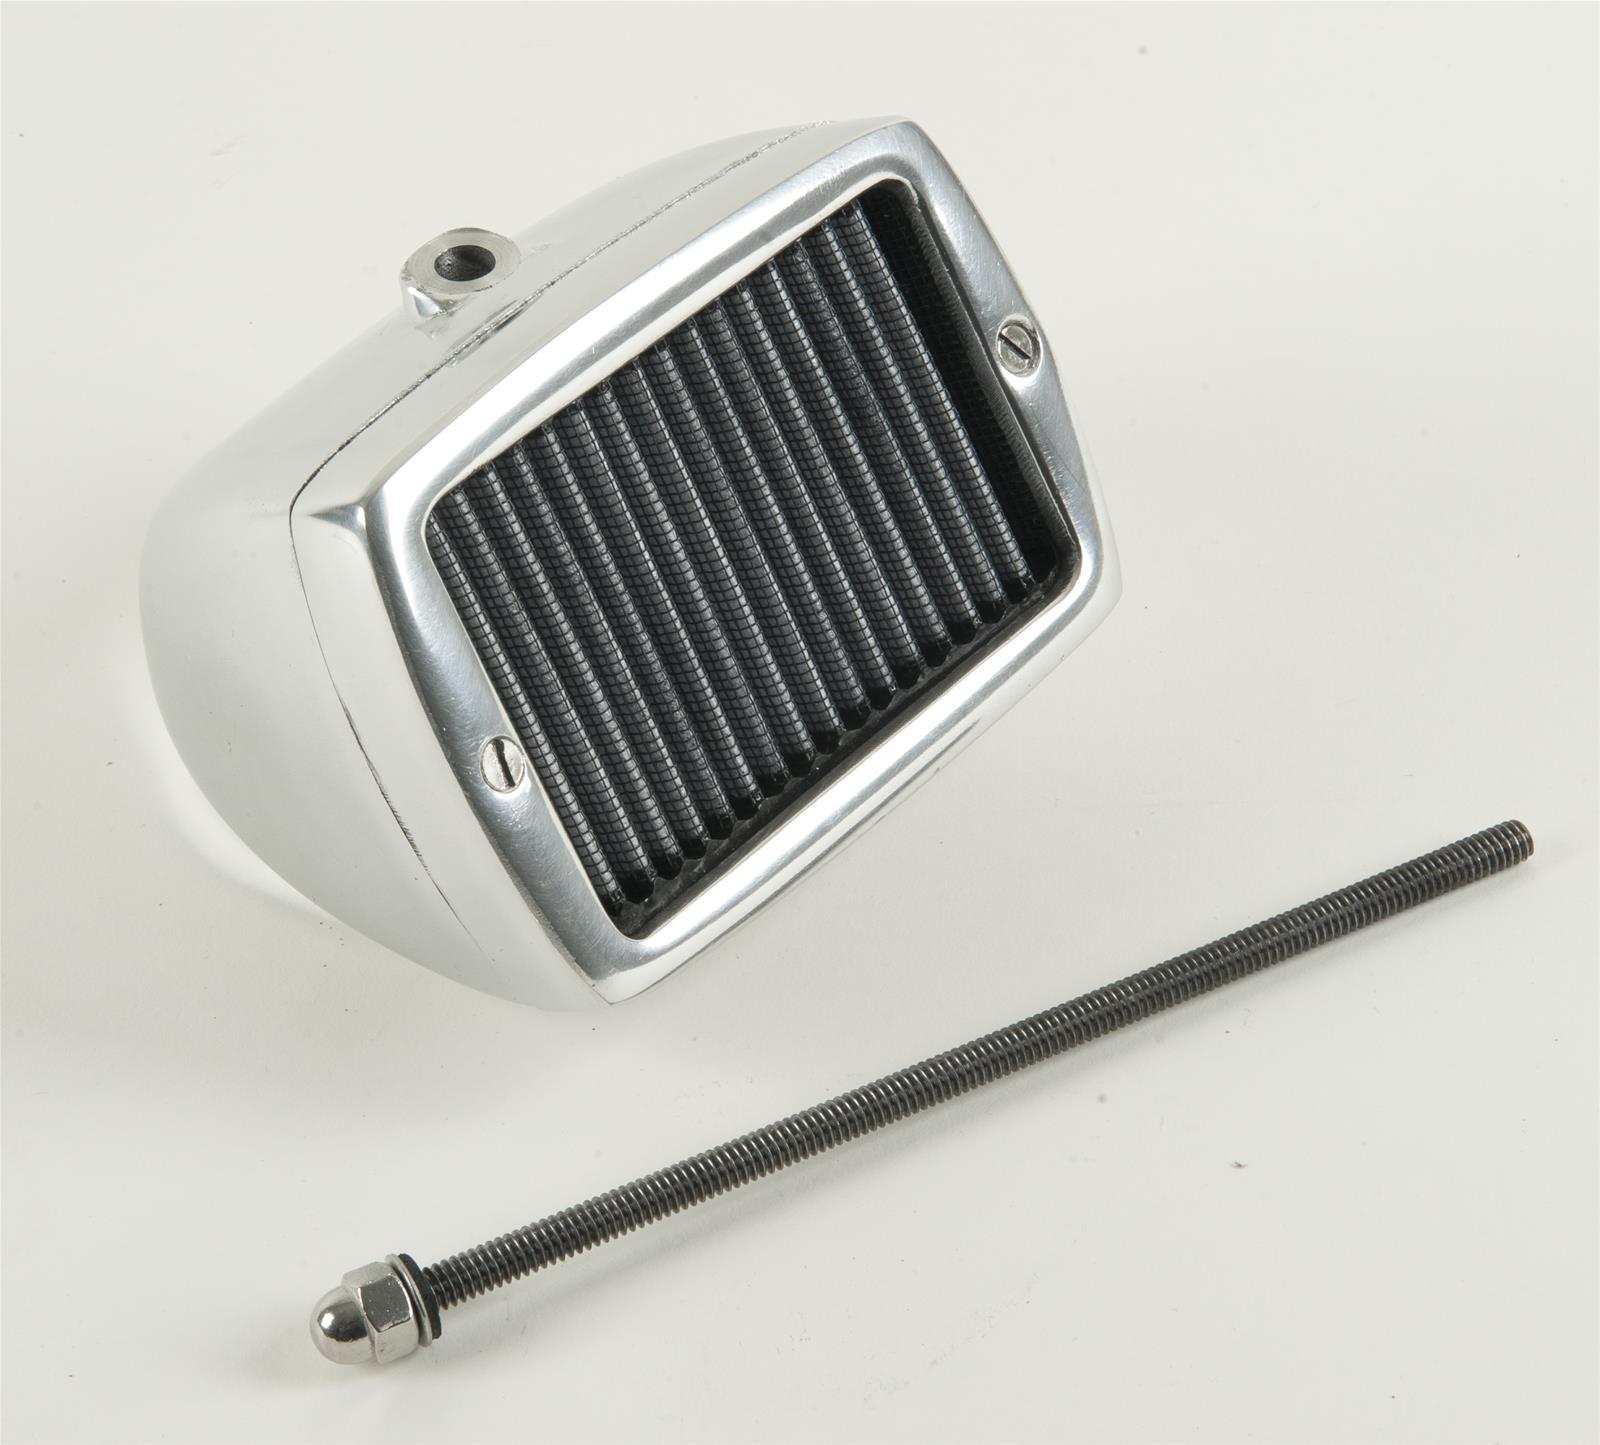 Cal Custom Air Cleaner : Cal custom« spark arrestor style air cleaner o ebay